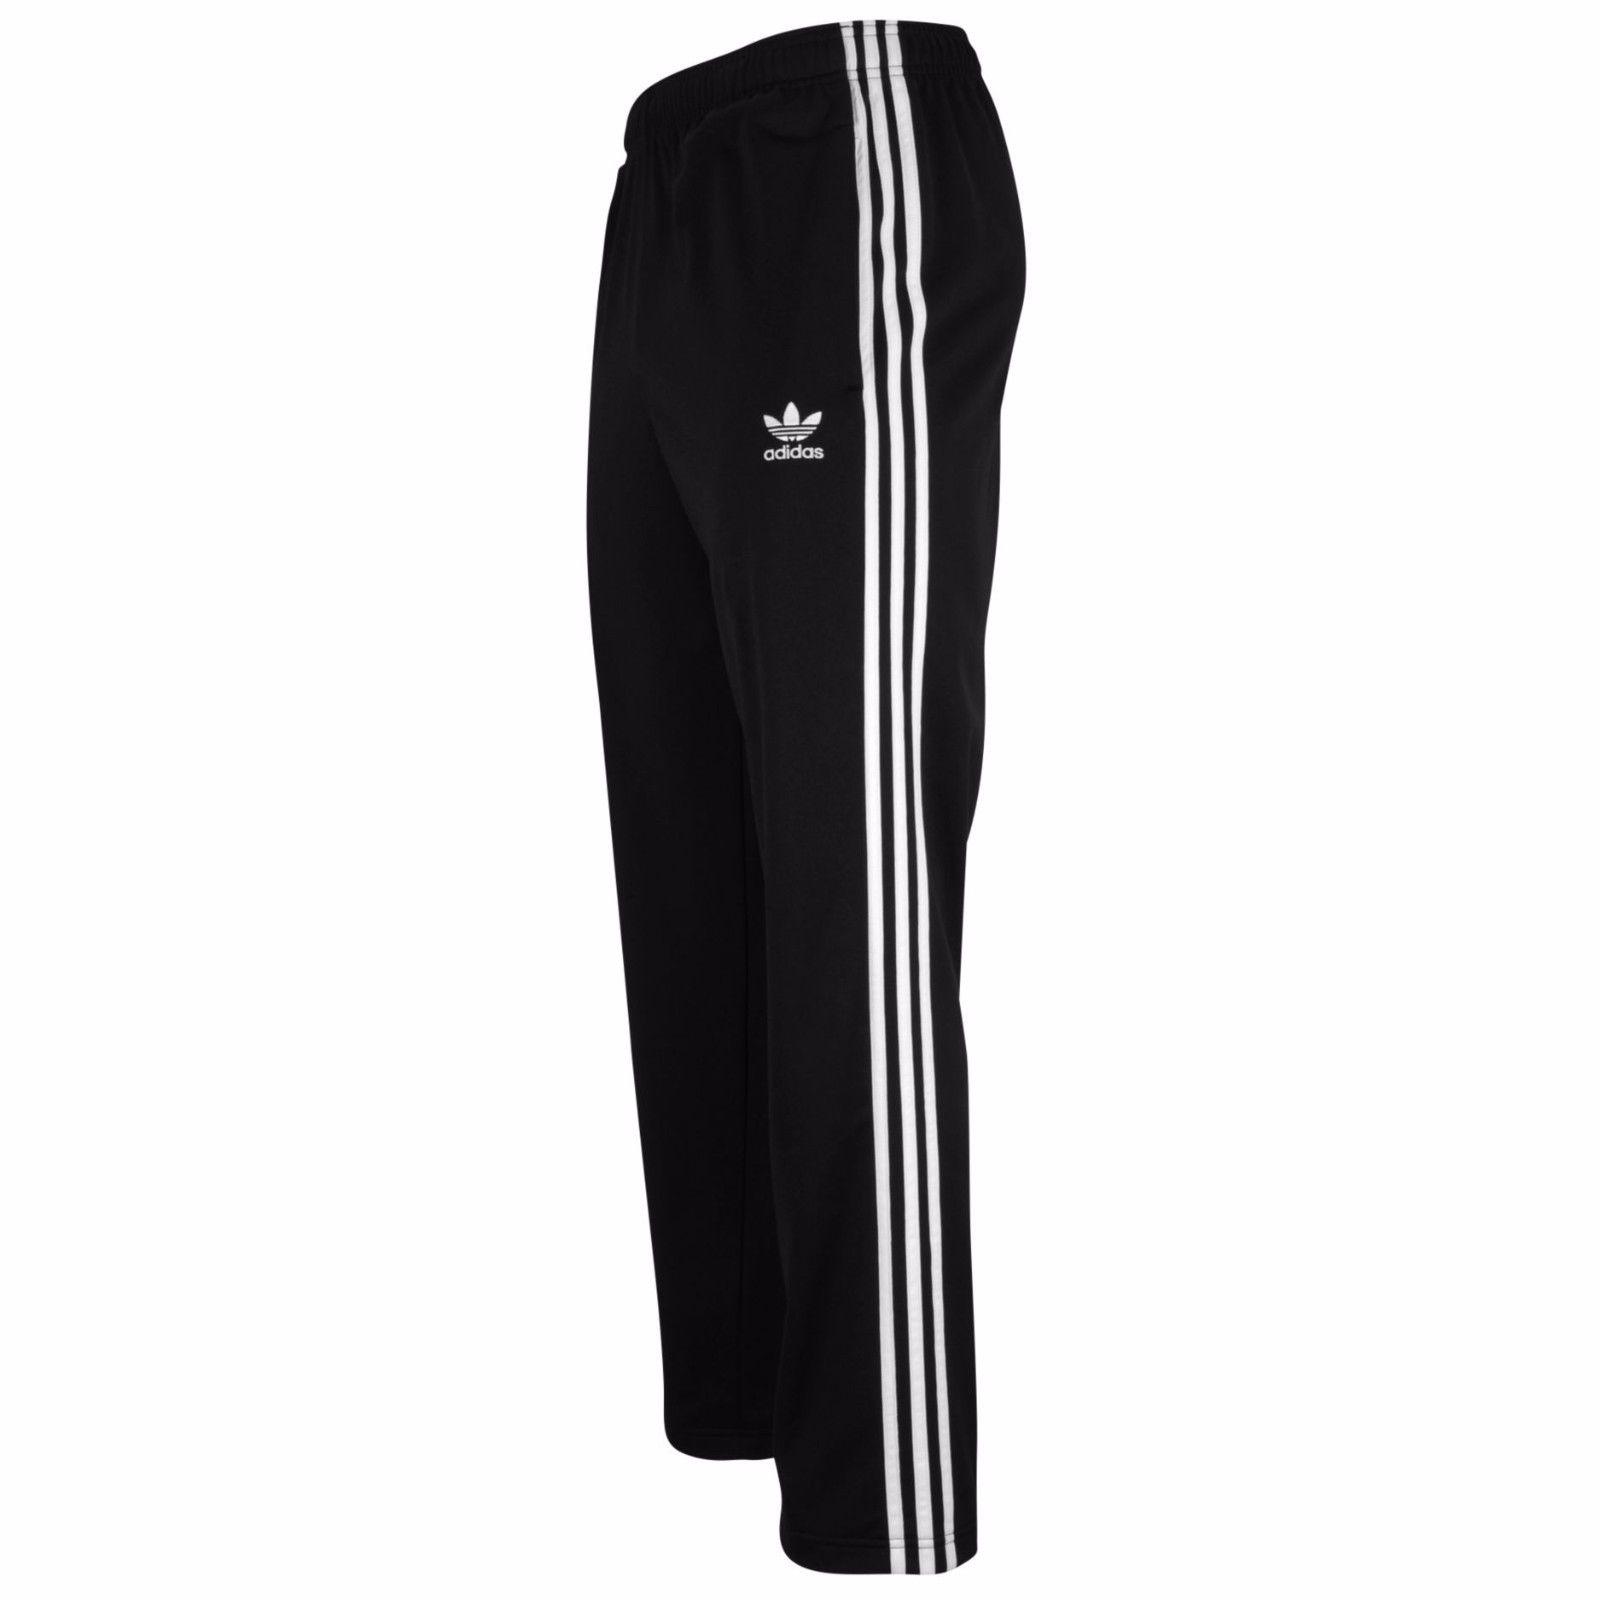 adidas joggers large adidas originals menu0027s superstar track pants f80896 black/white  joggers ZNGXCJV